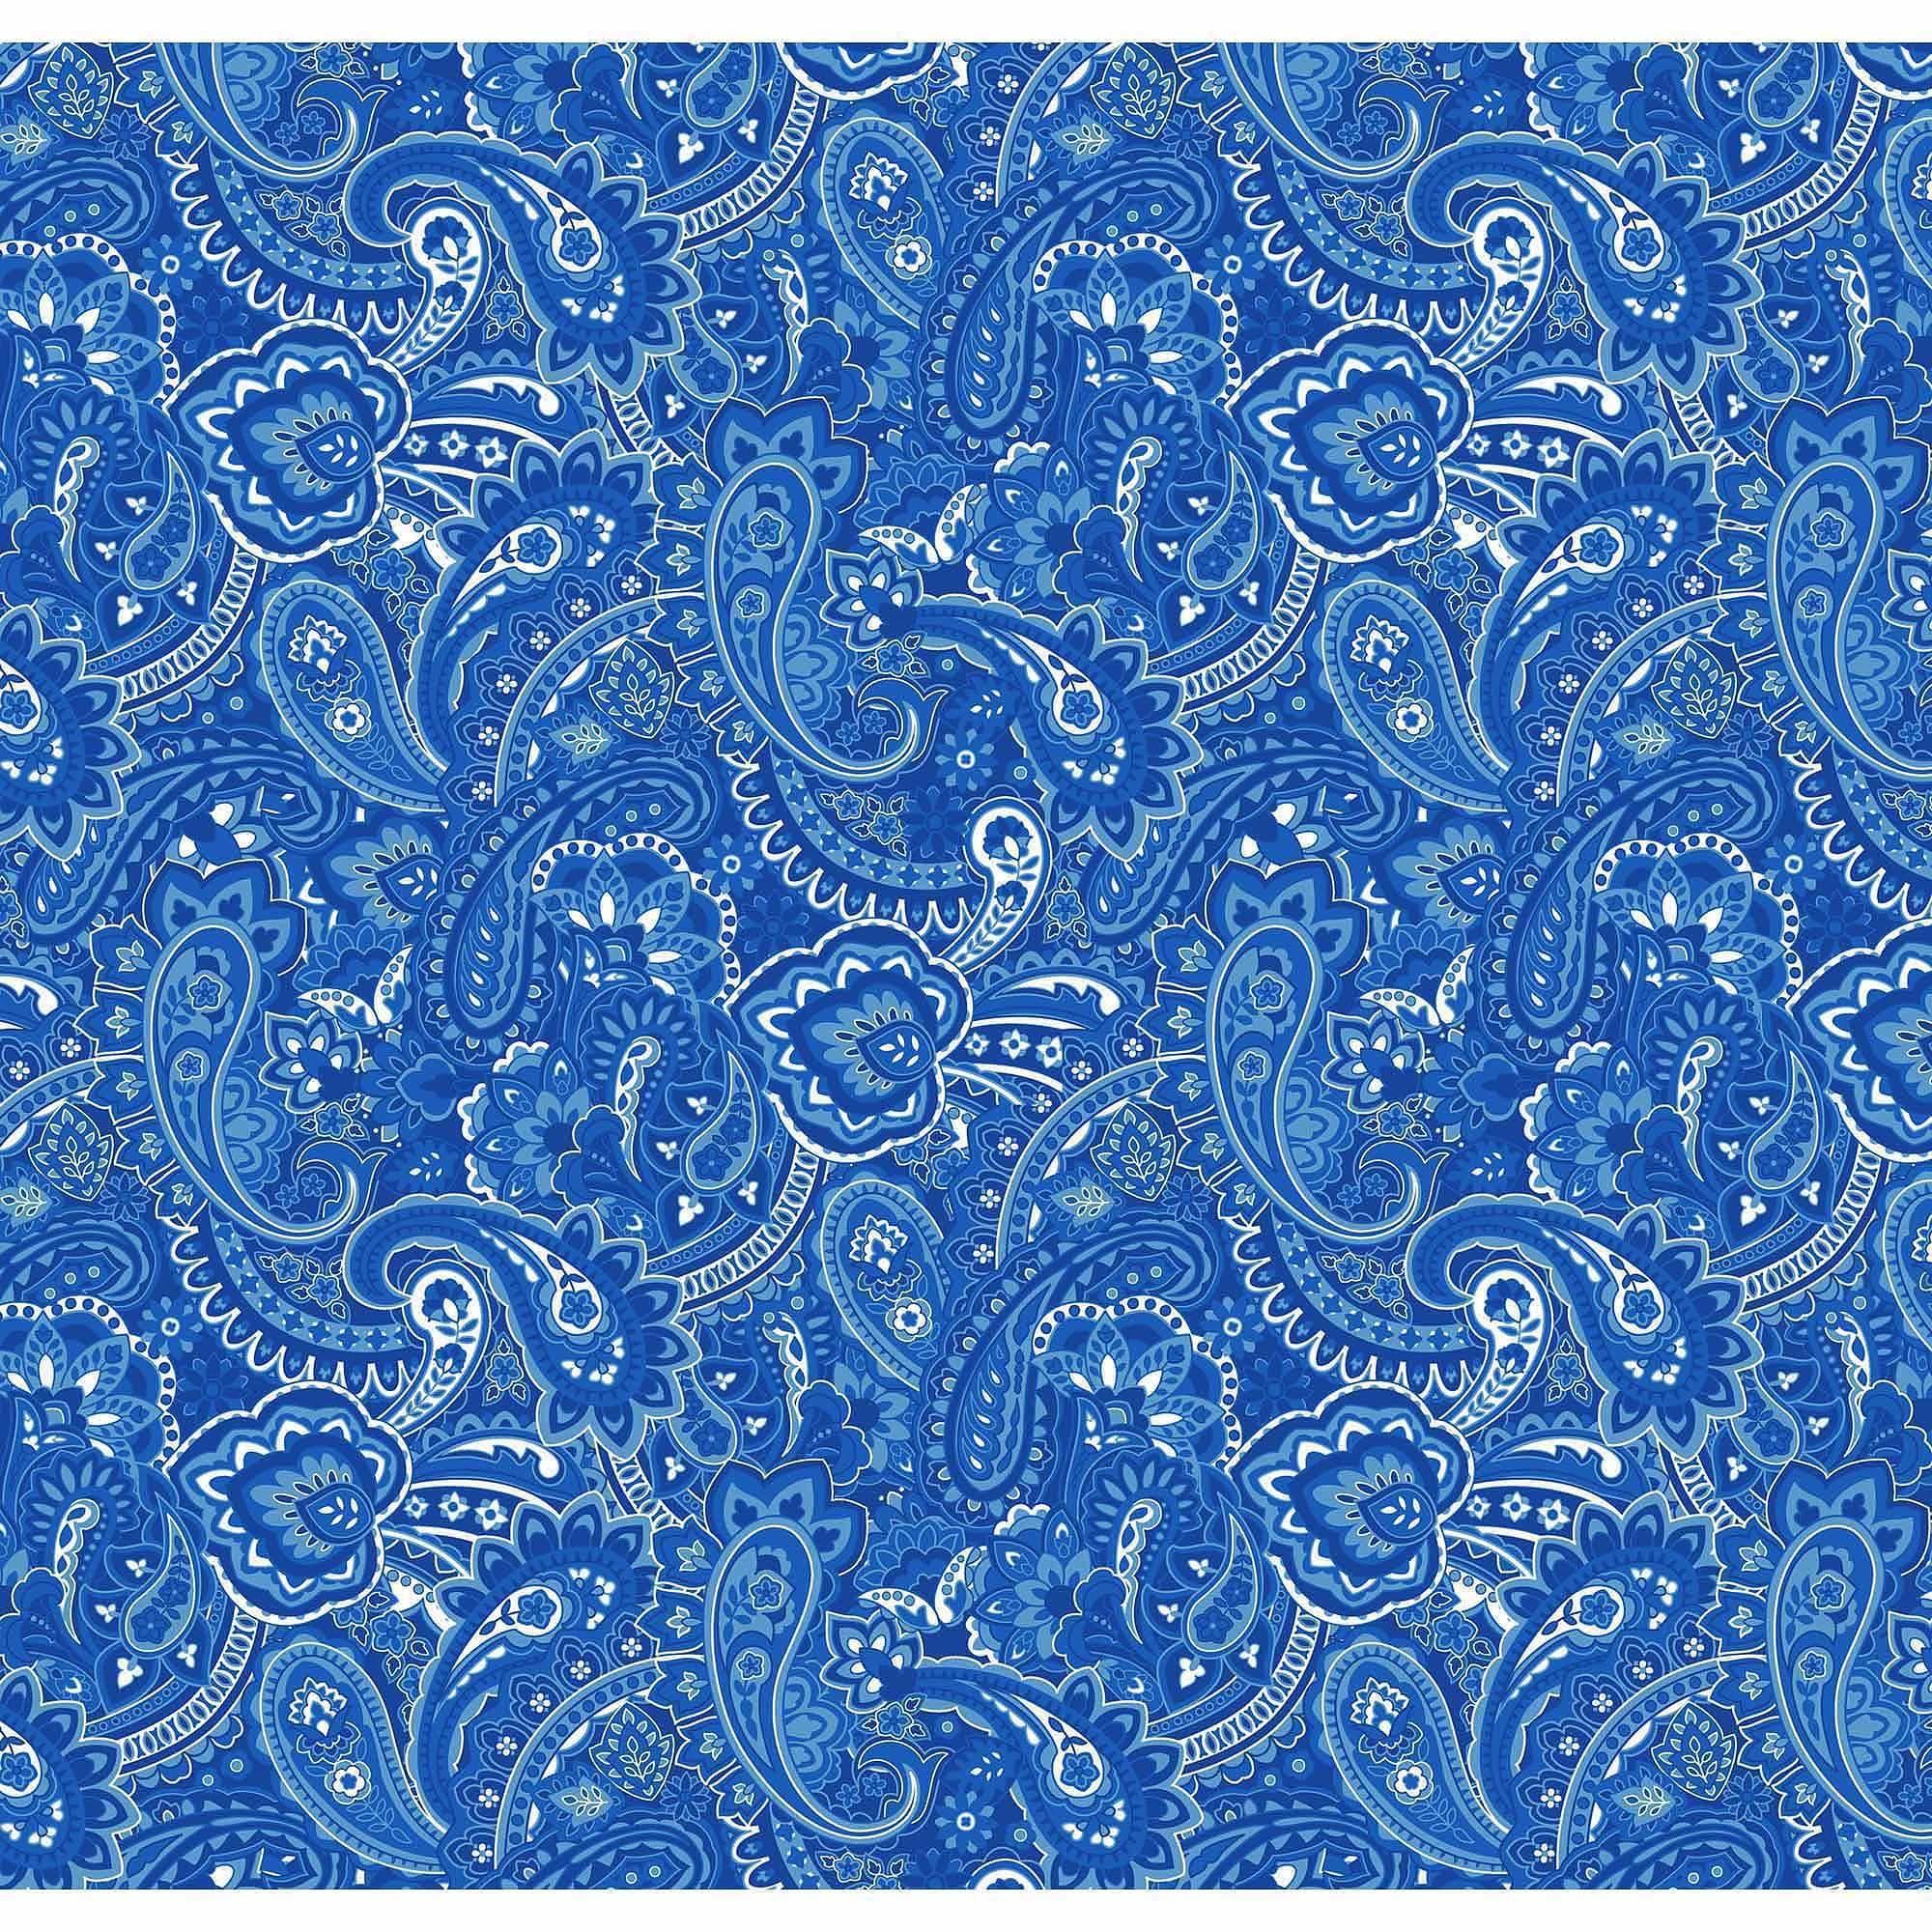 Cotton Fabric By The Yard Fabric Walmart Com Paisley Fabric